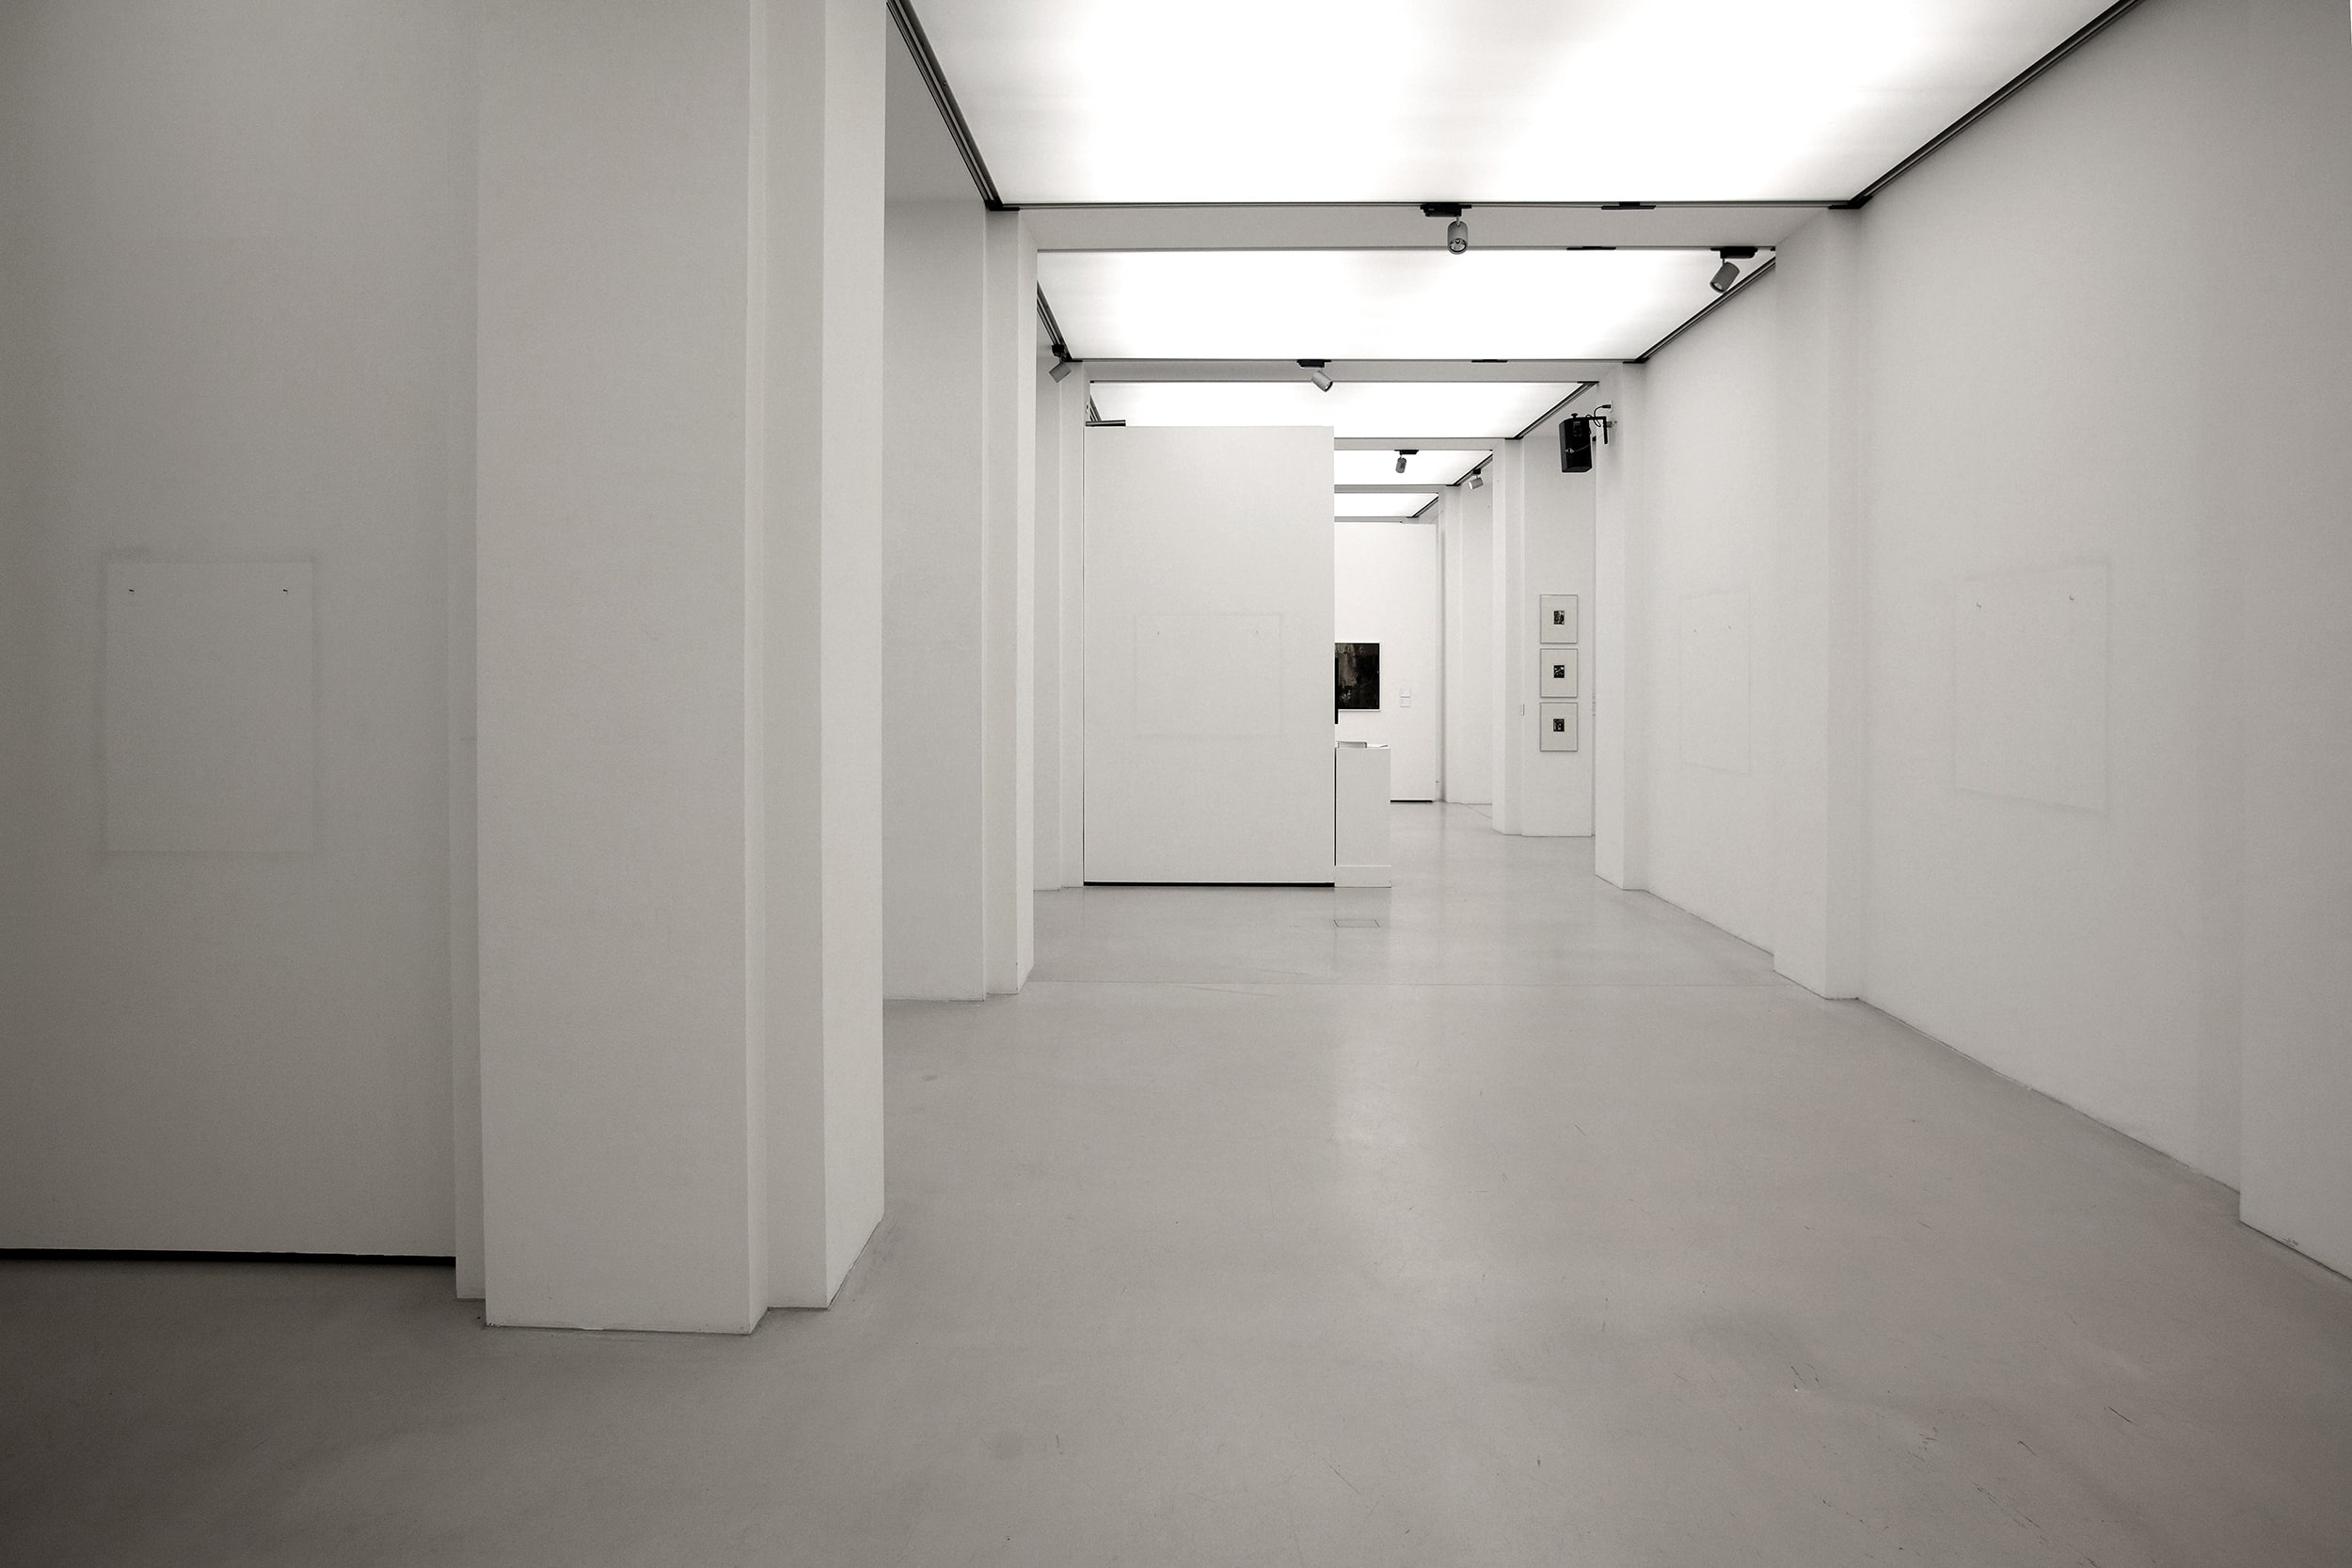 Katharina-Stiglitz-Untitled-To-Forget-01